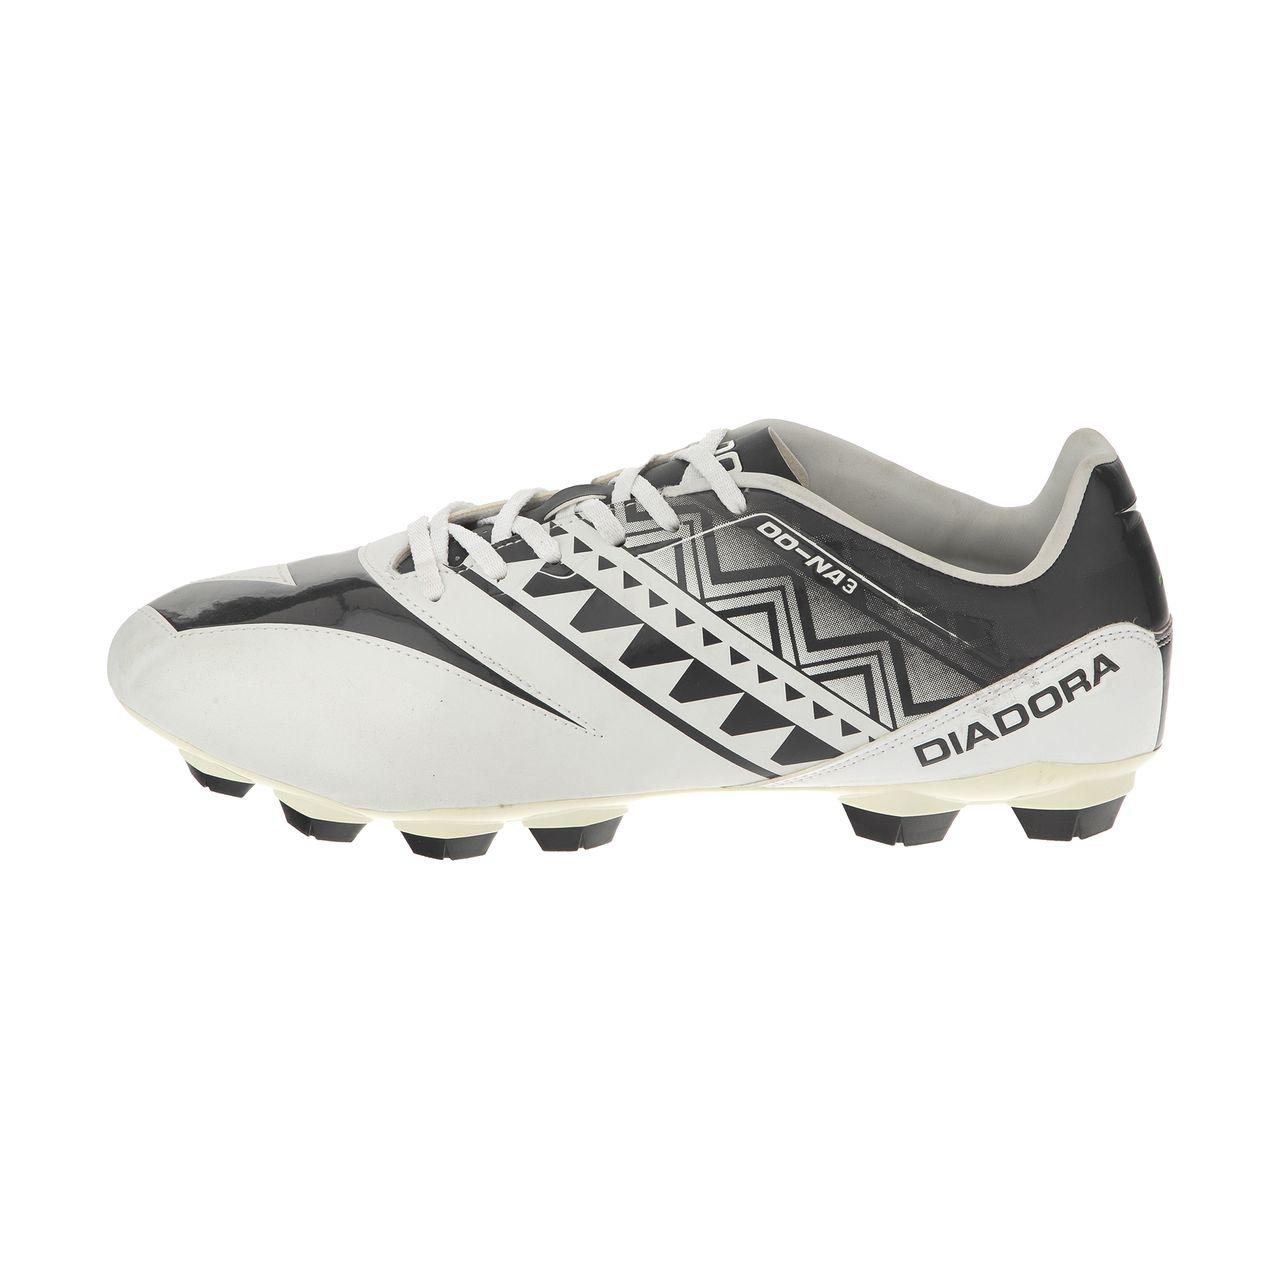 کفش فوتبال دیادورا مدل DD-NA3 R LPU